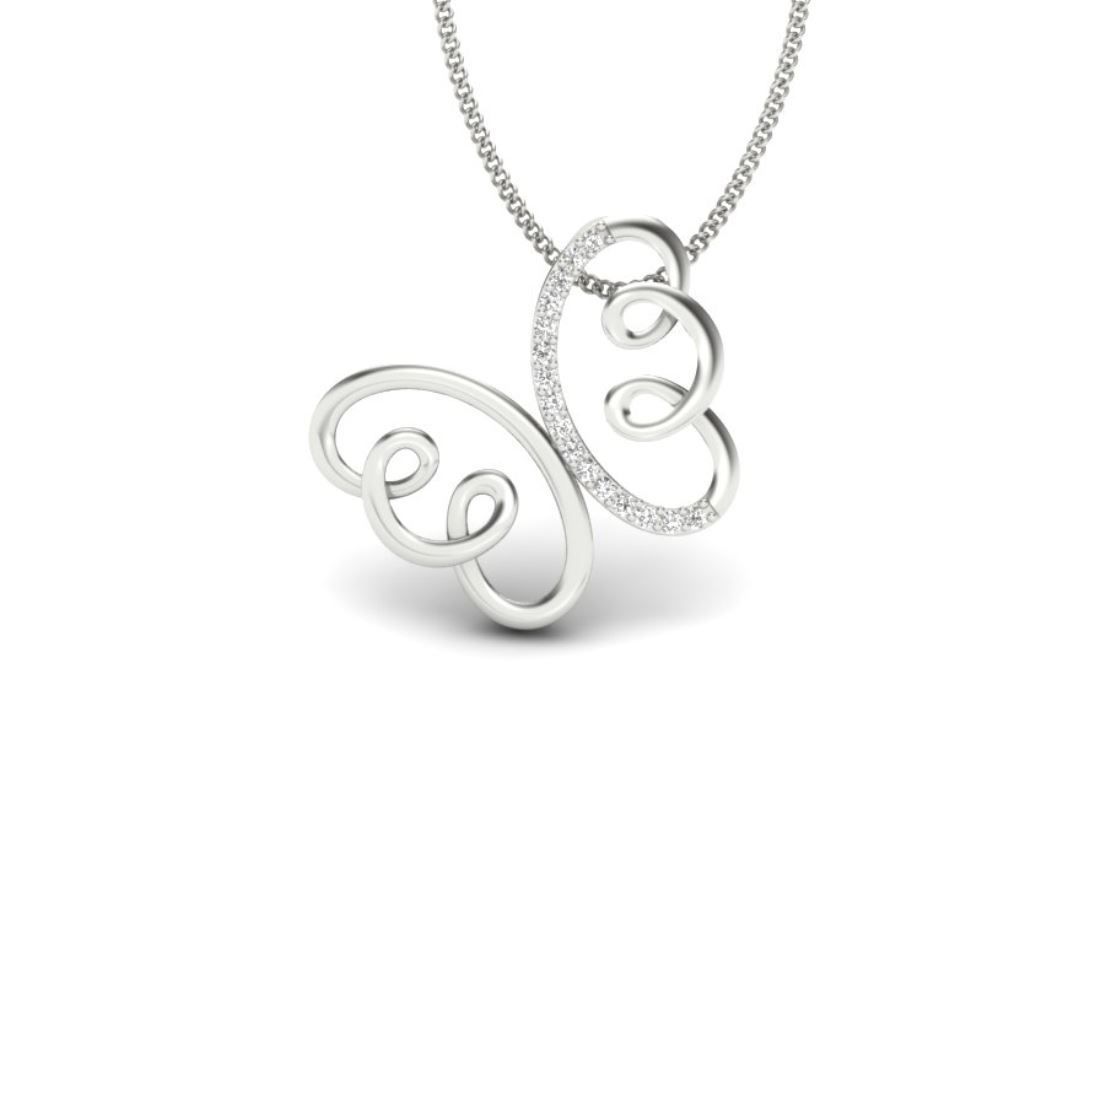 Daily wear silver Pendant